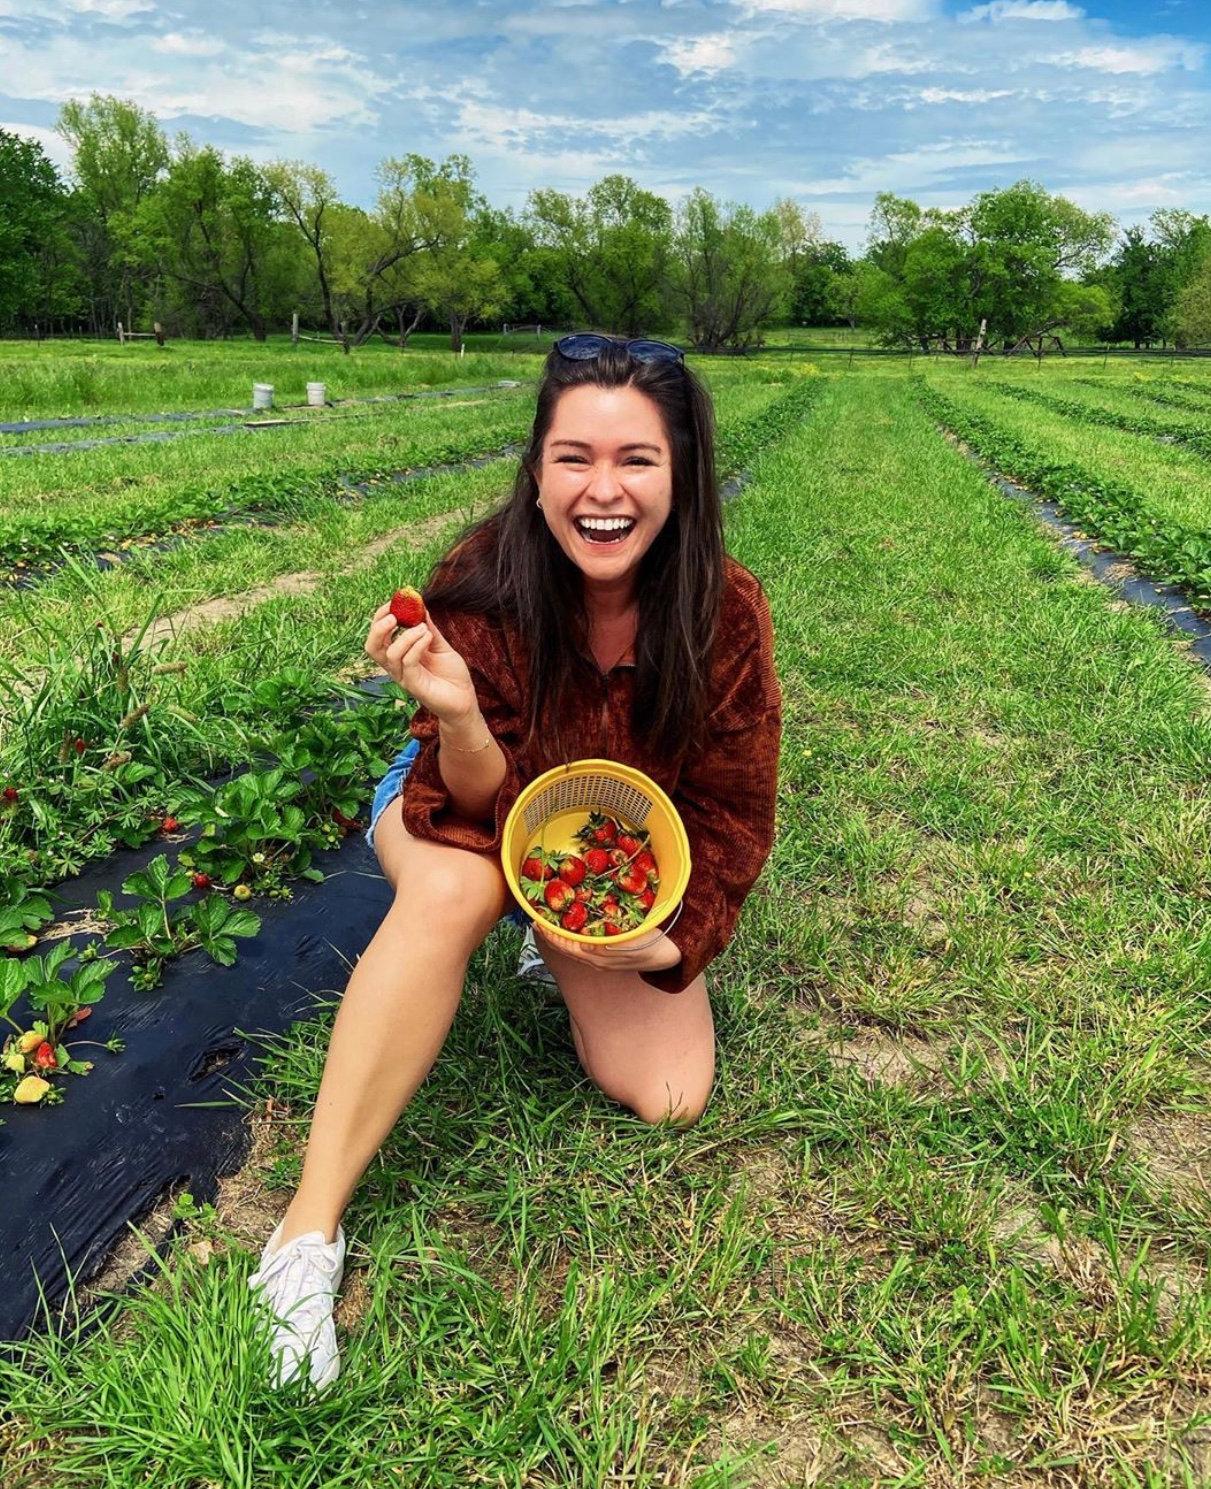 You Pick 'Em Strawberries